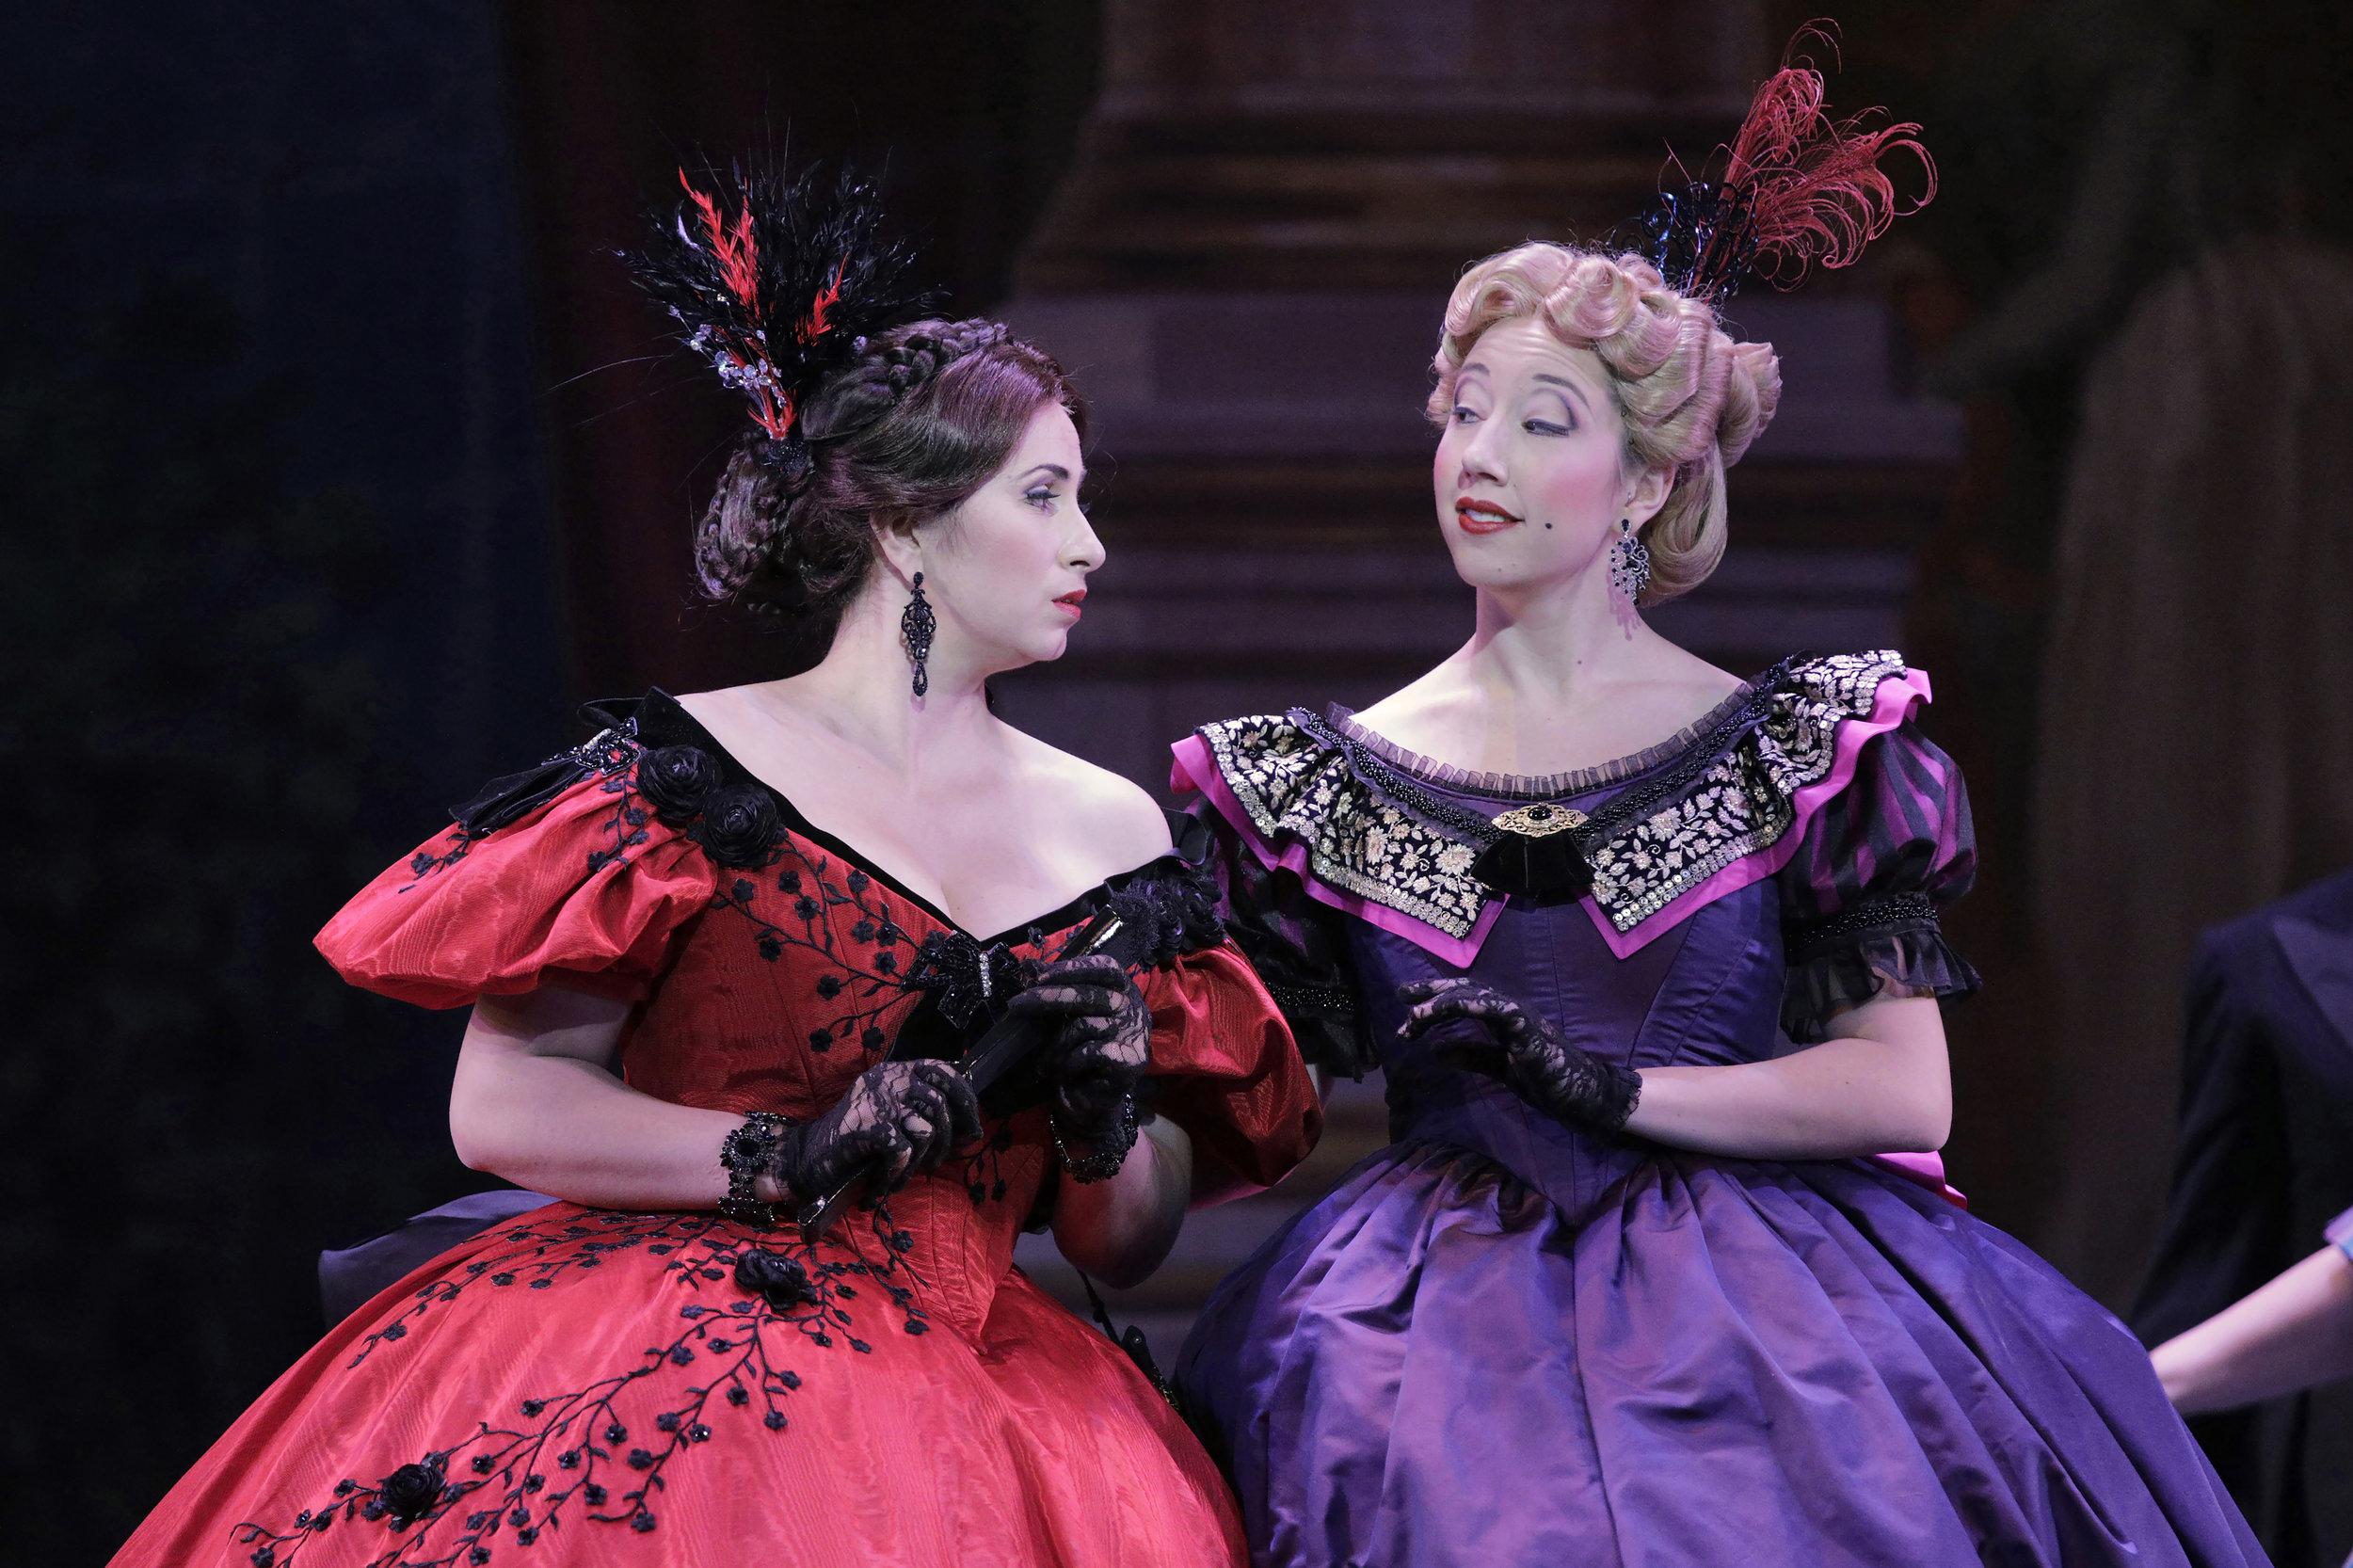 La Traviata Portland Opera Directed by Elise Sandell Photo by Cory Weaver Photography